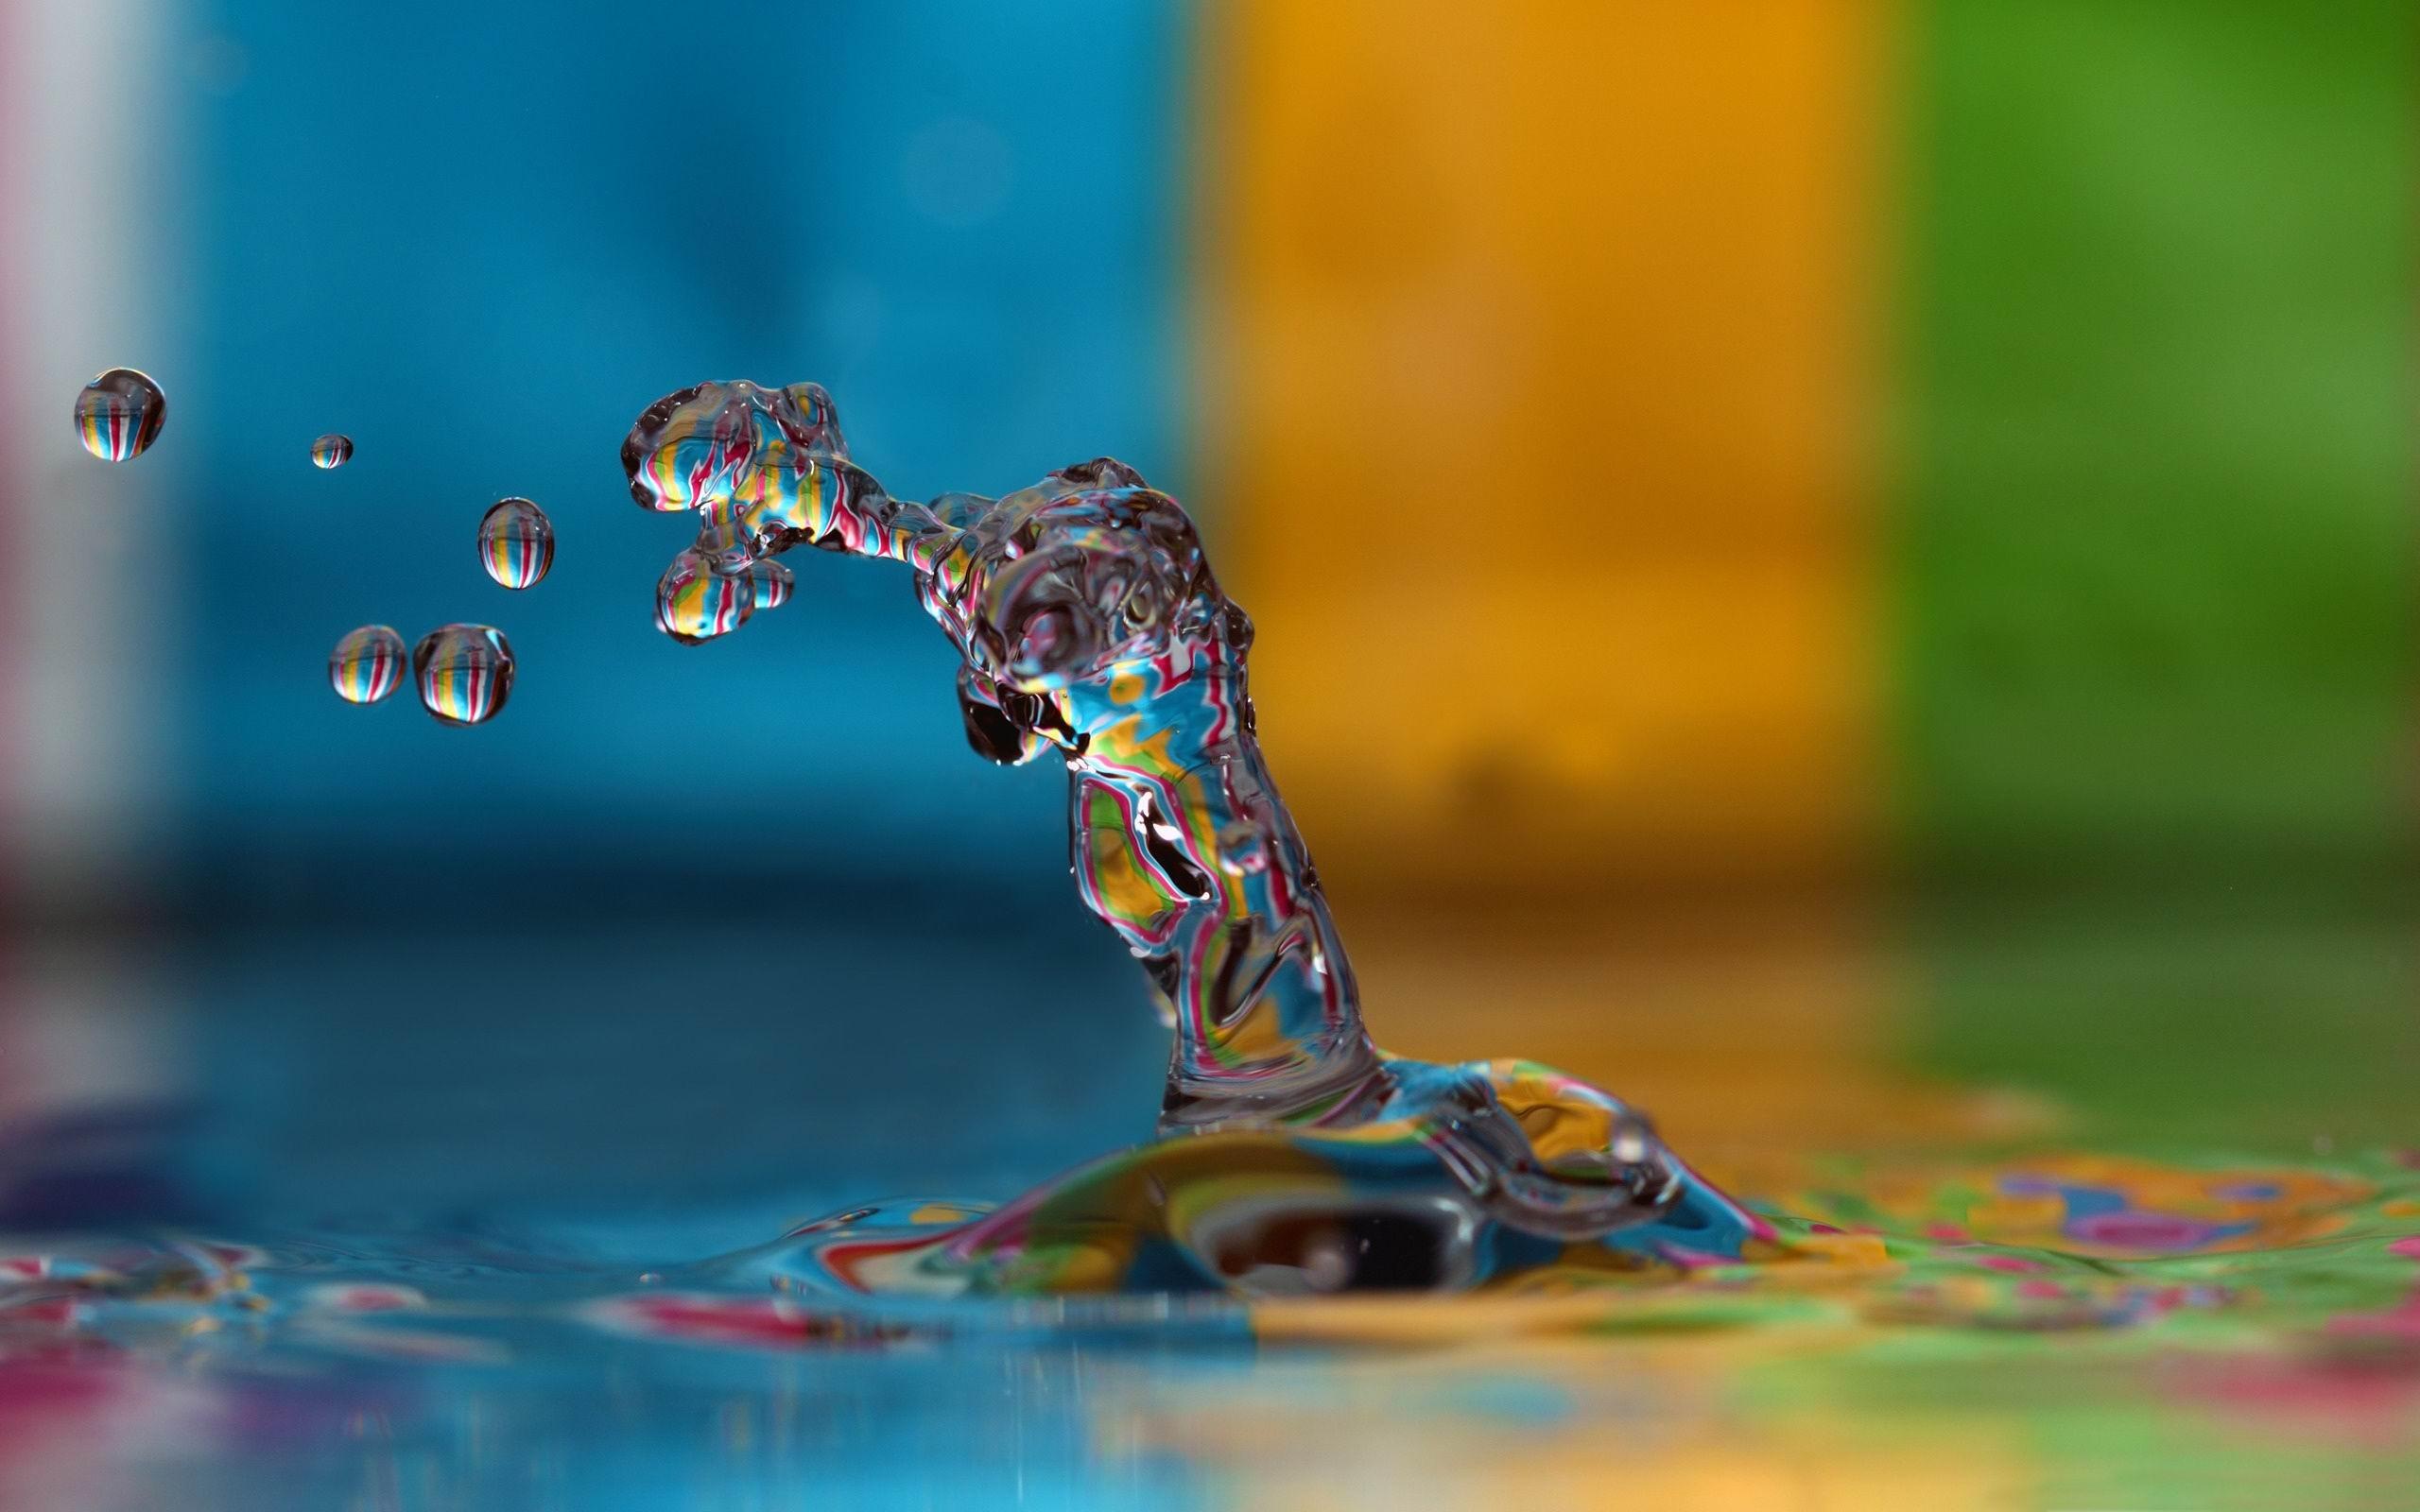 Color Splash Wallpapers on